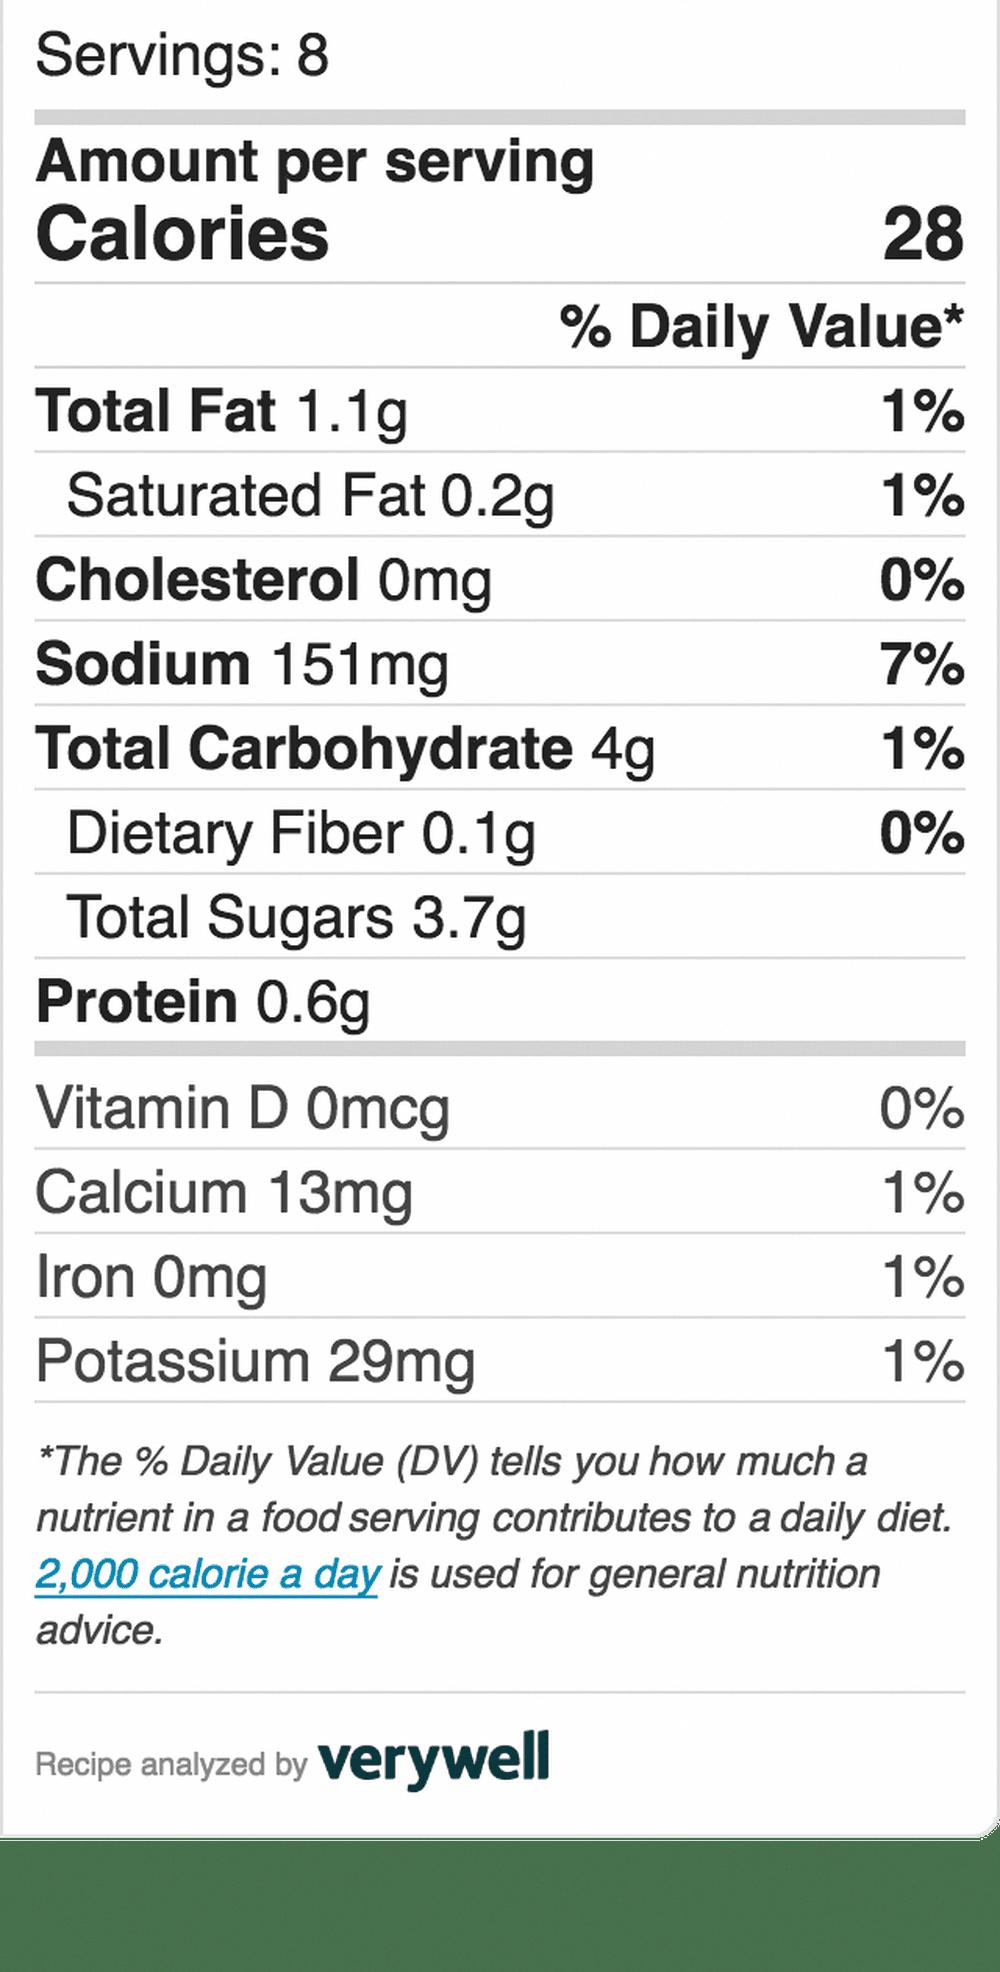 Creamy Balsamic Salad Dressing-Homemade Food Junkie #nutritionfactscalculator #nutritioncalculator